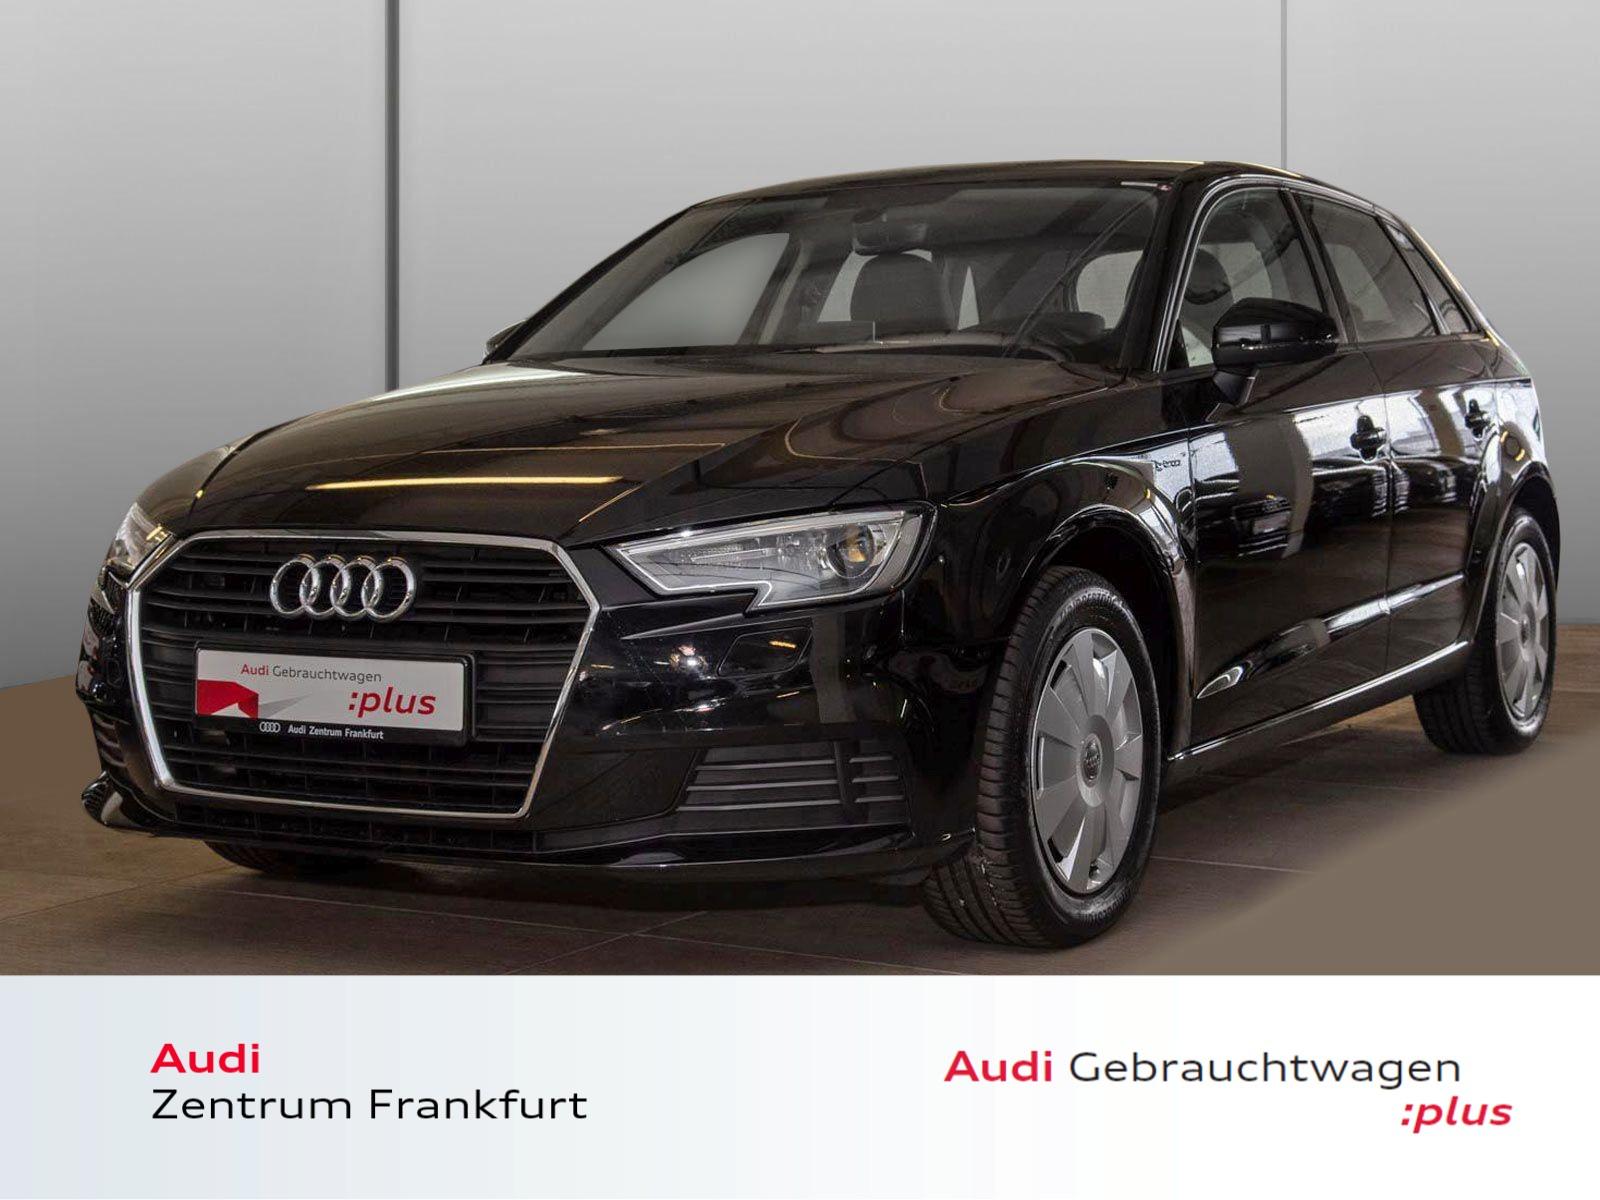 Audi A3 Sportback g-tron 1.4 TFSI Xenon B&O PDC Bluetooth, Jahr 2018, other